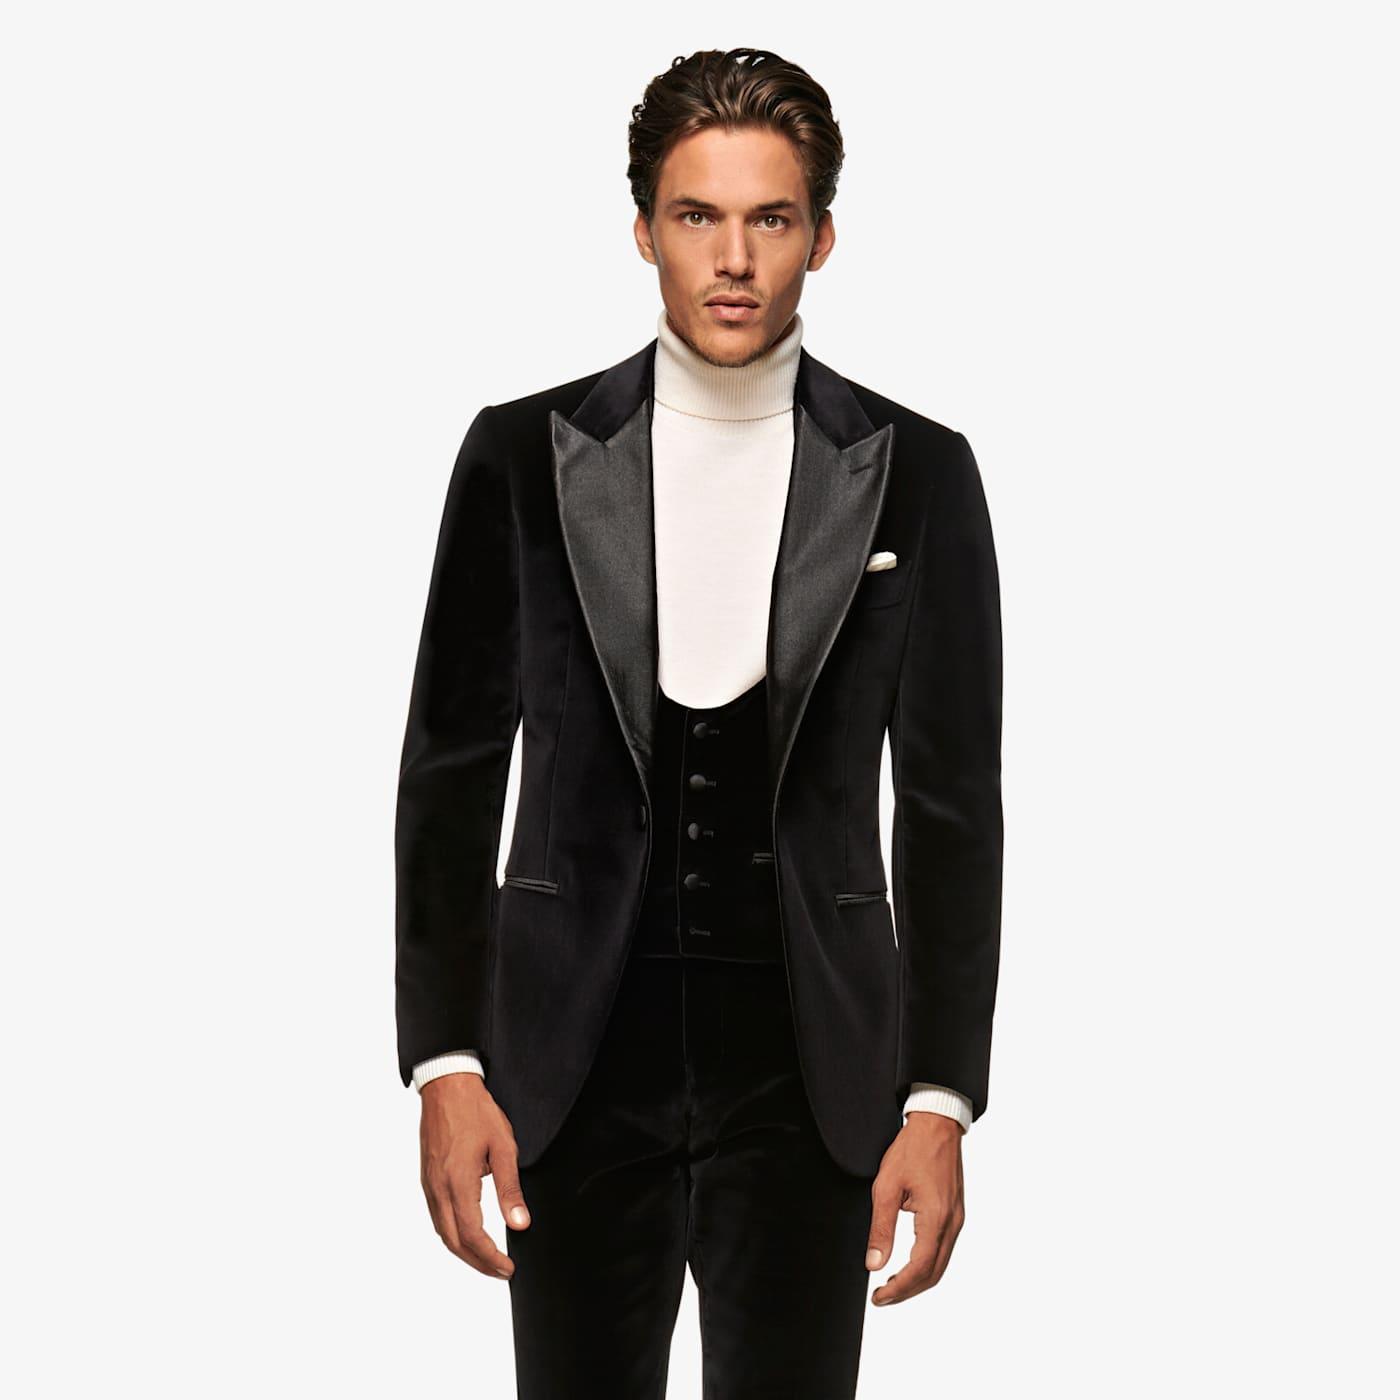 New Vintage Tuxedos, Tailcoats, Morning Suits, Dinner Jackets Black Lazio Tuxedo Suit $699.00 AT vintagedancer.com